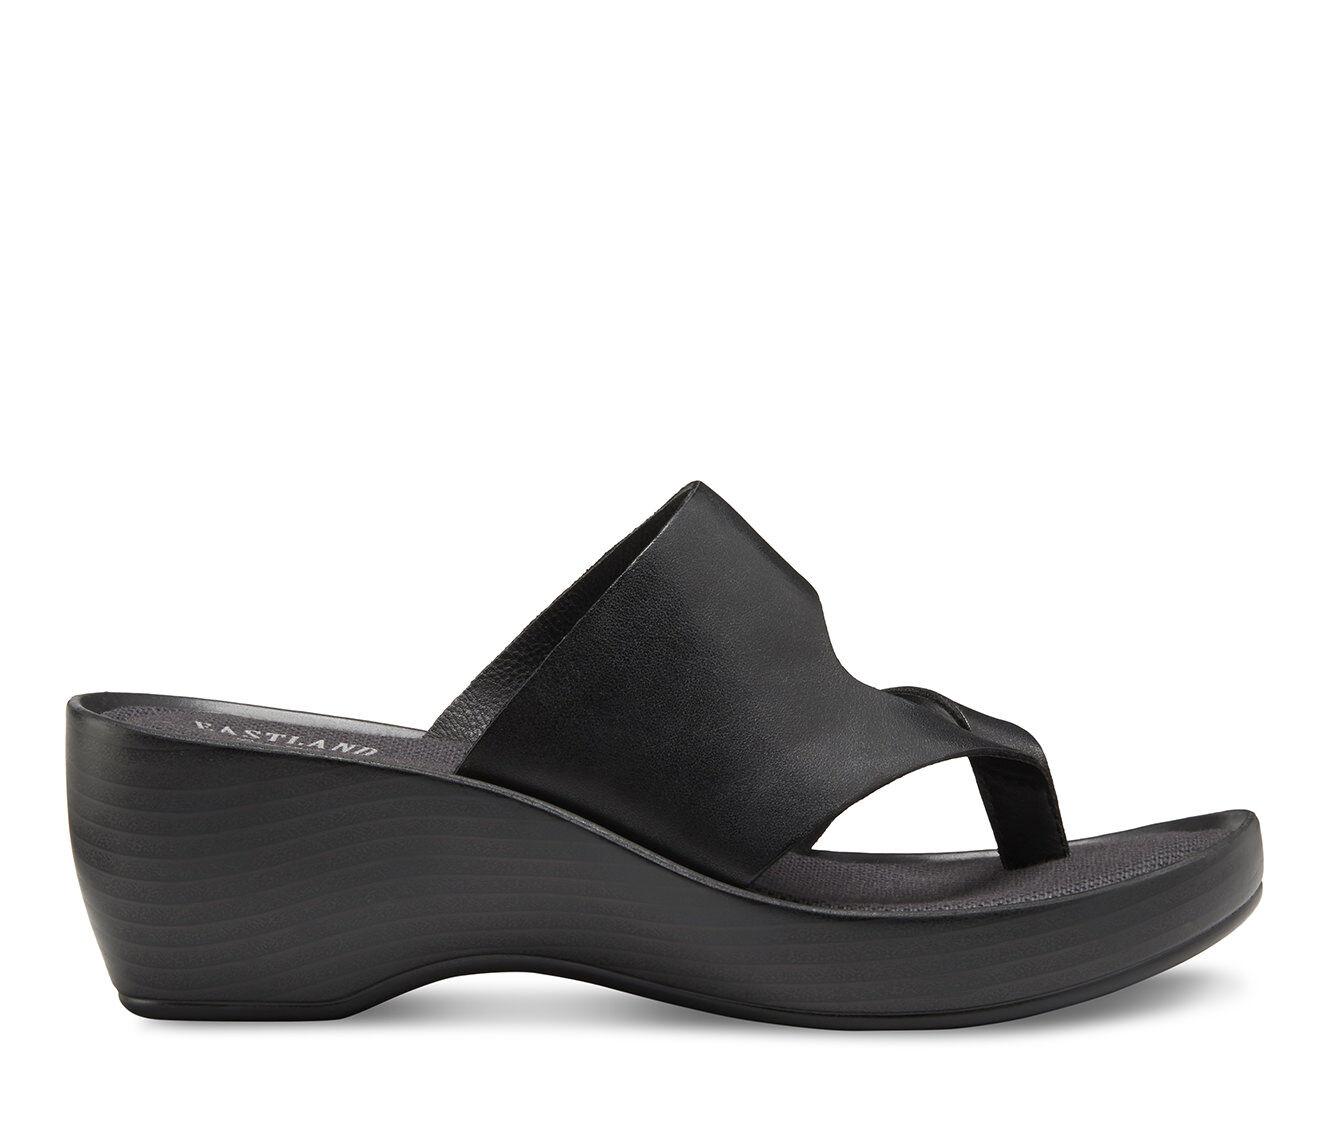 choose new series Women's Eastland Laurel Sandals Black